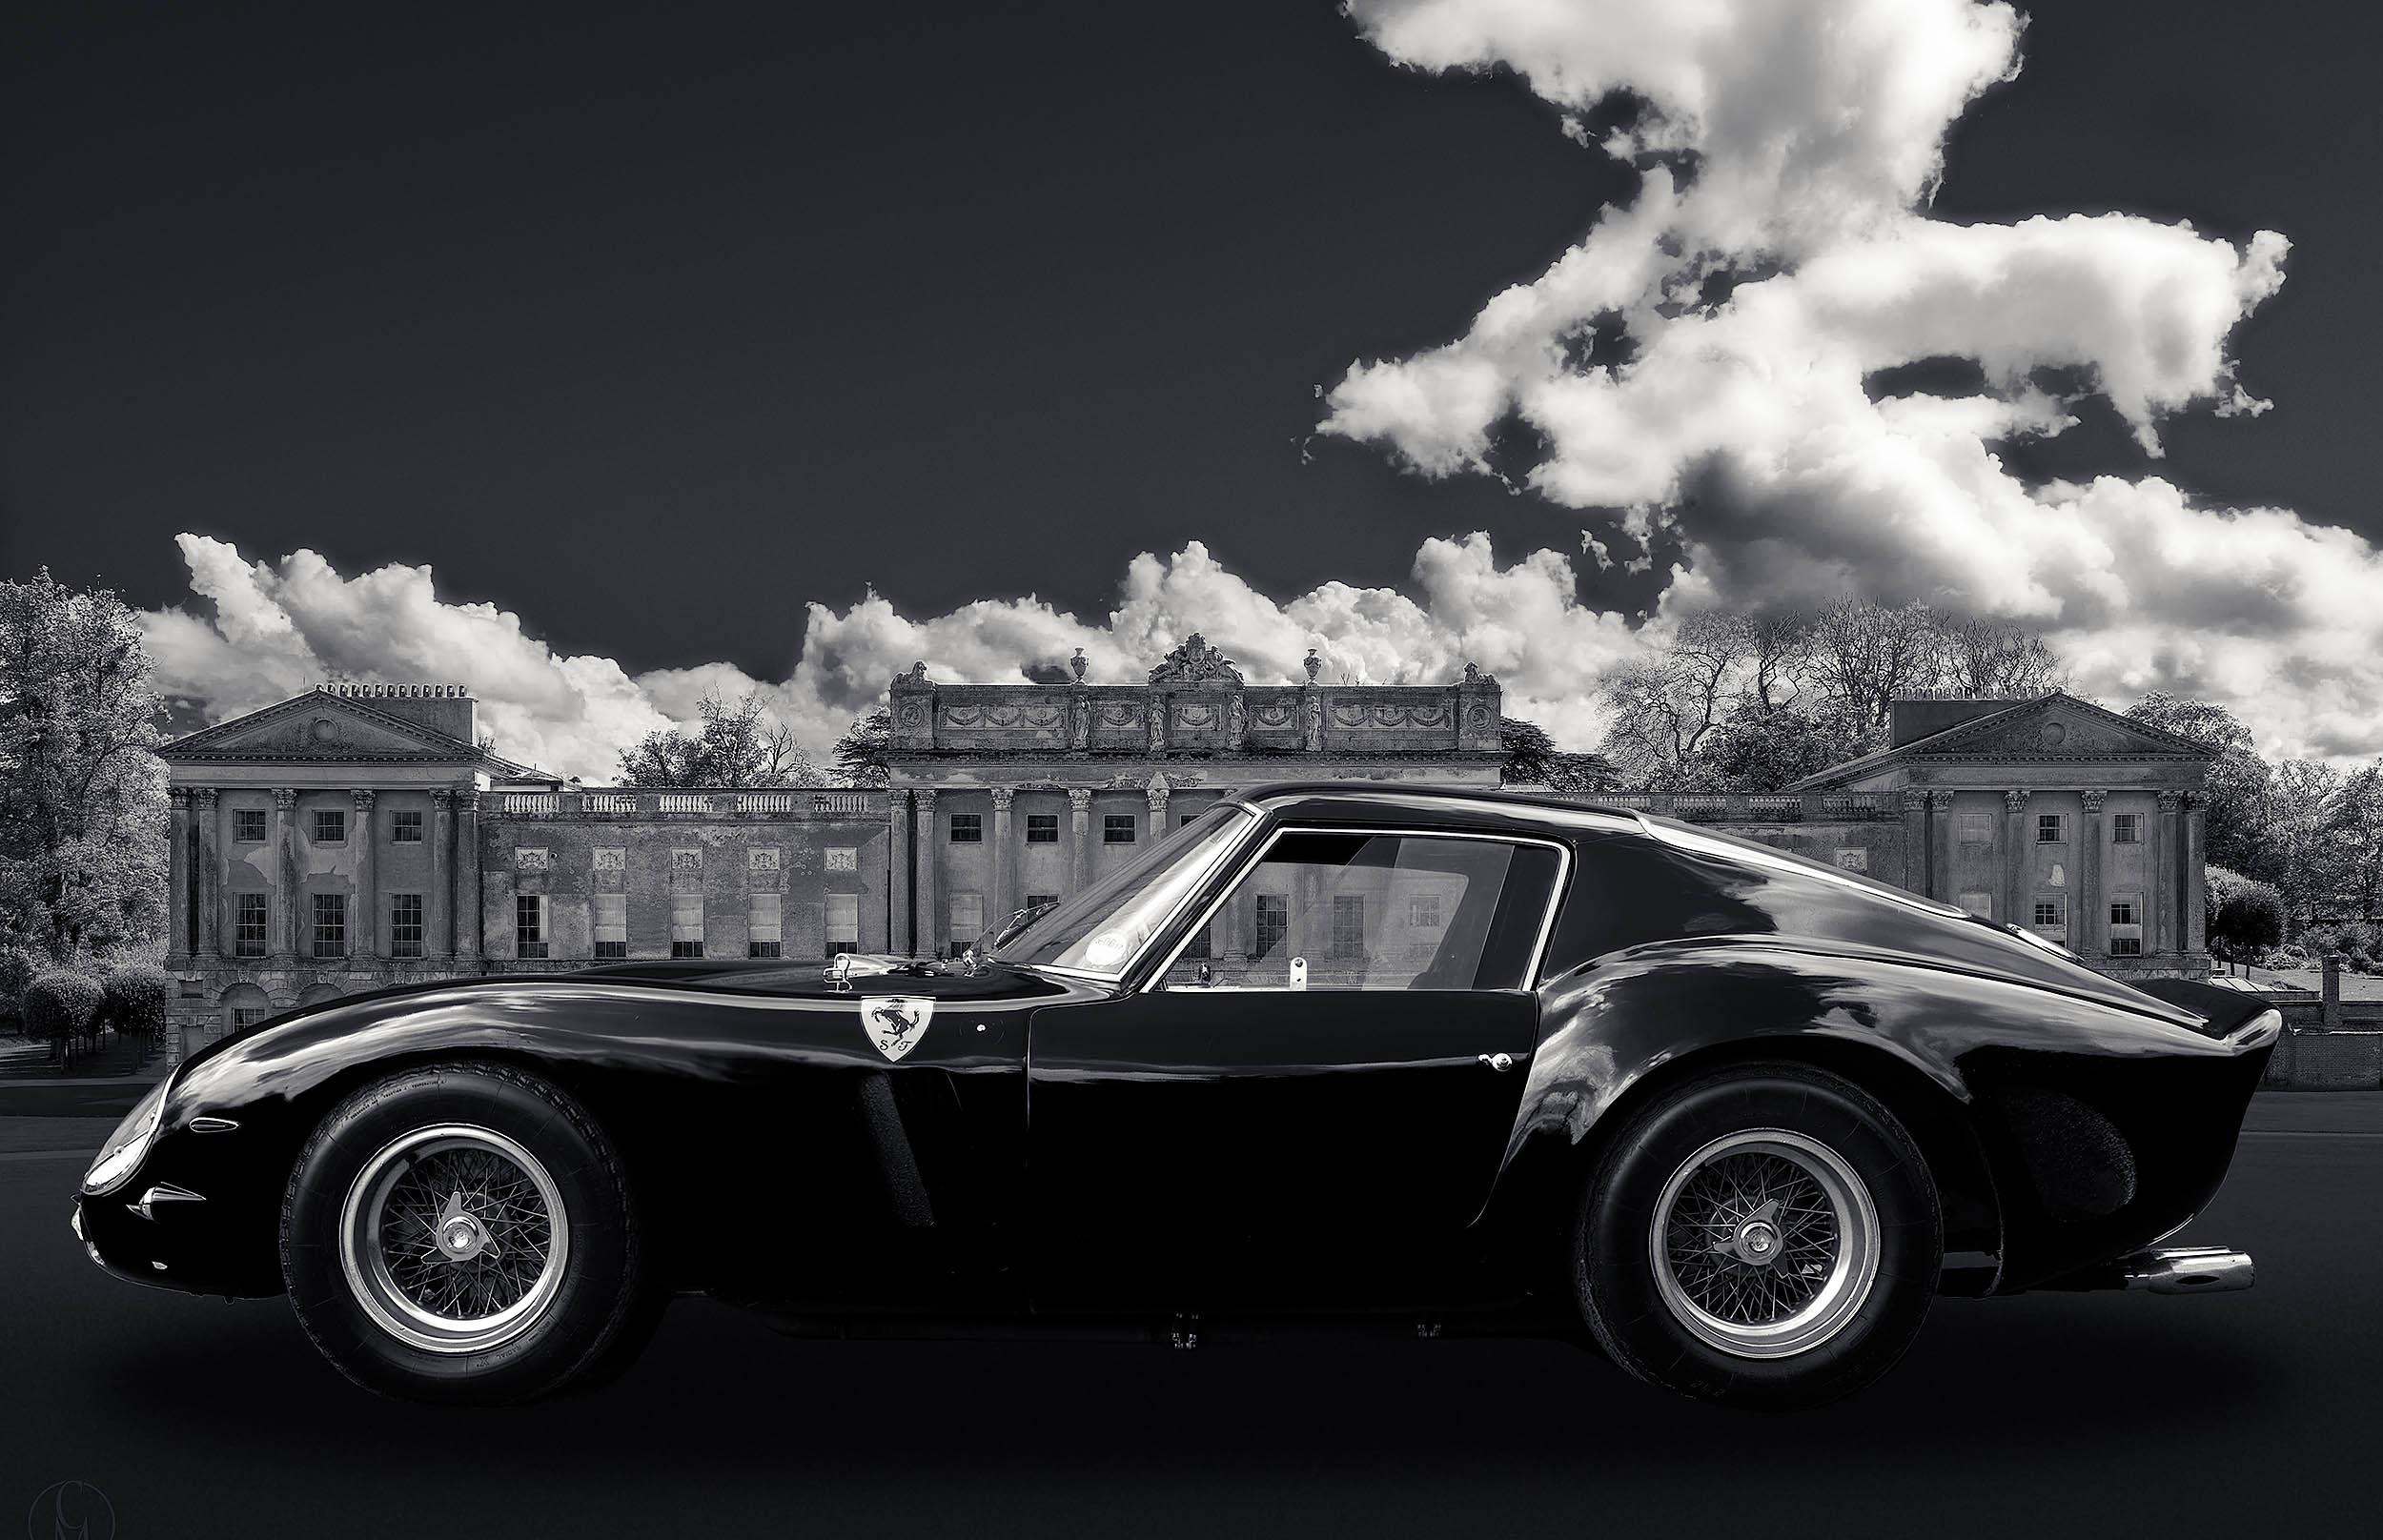 1964 Ferrari 250 GTO at Heveningham Hall